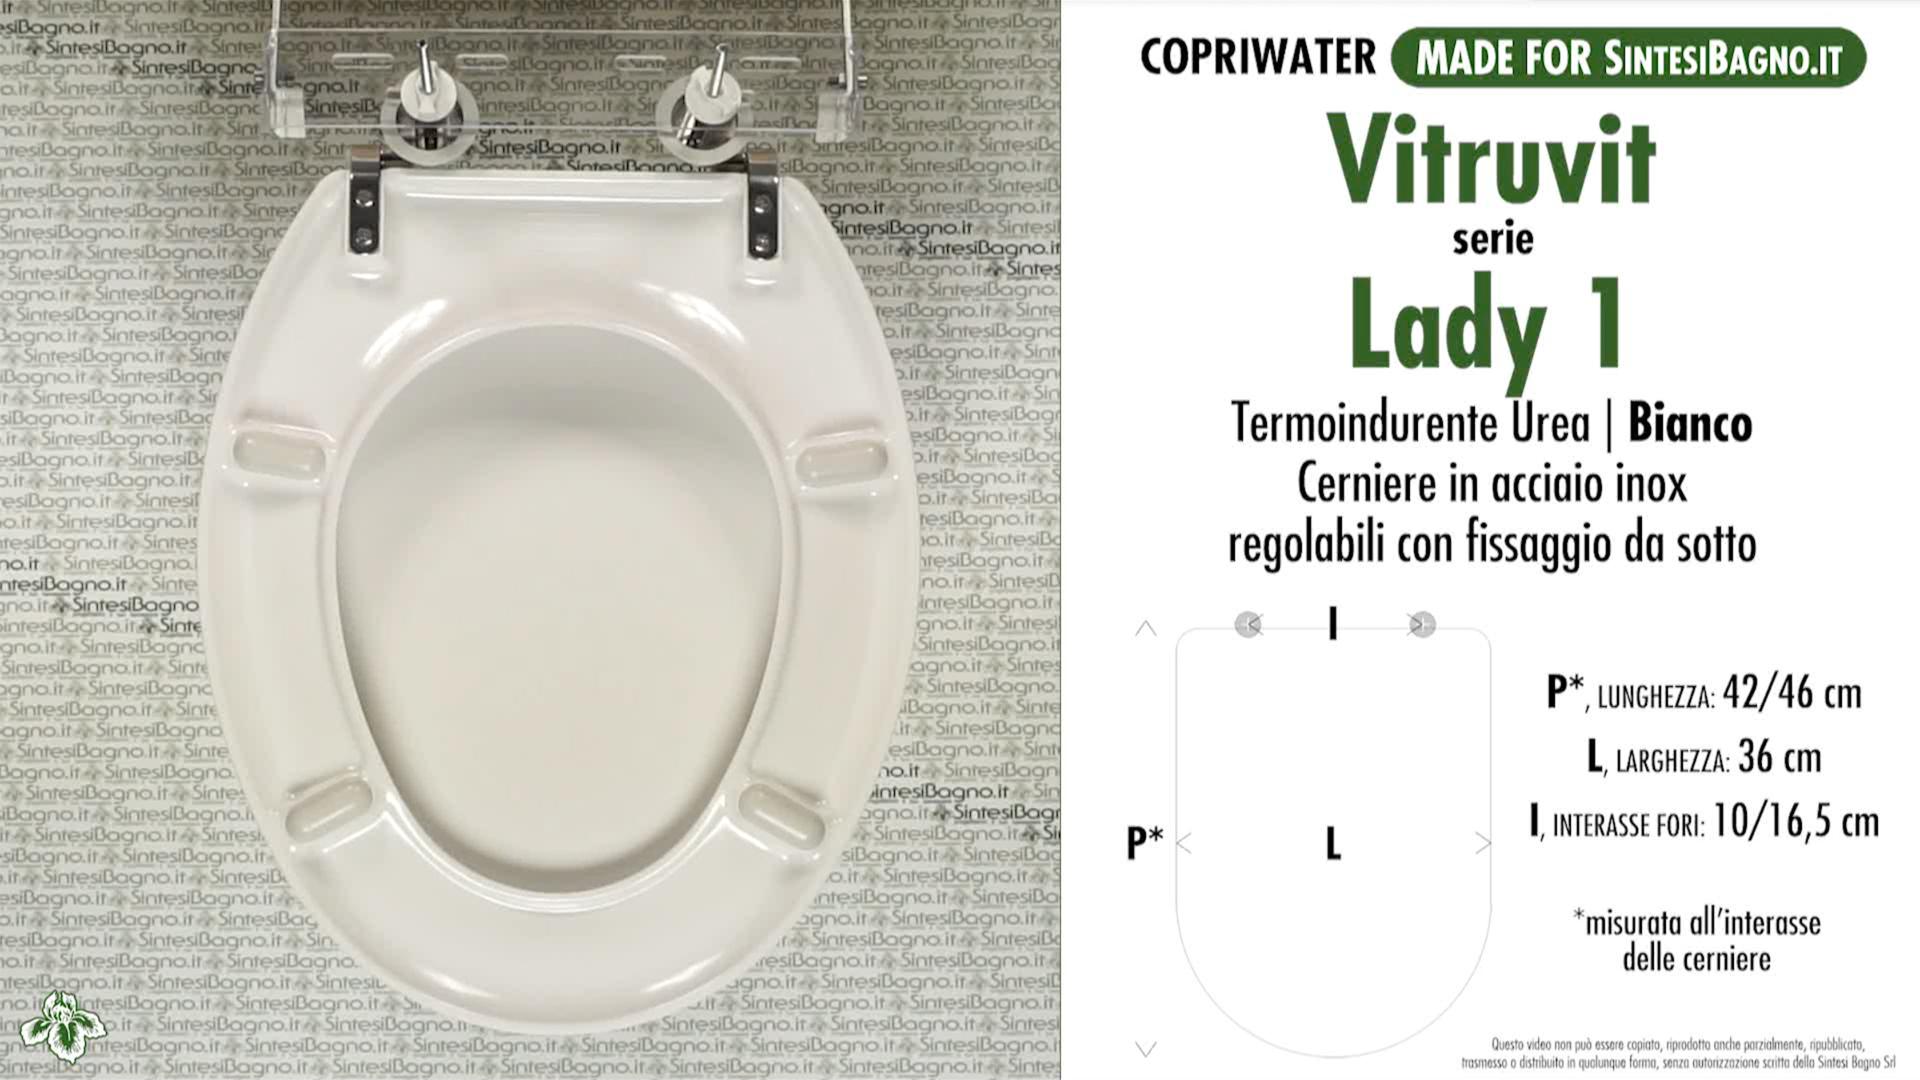 SCHEDA TECNICA MISURE copriwater VITRUVIT LADY